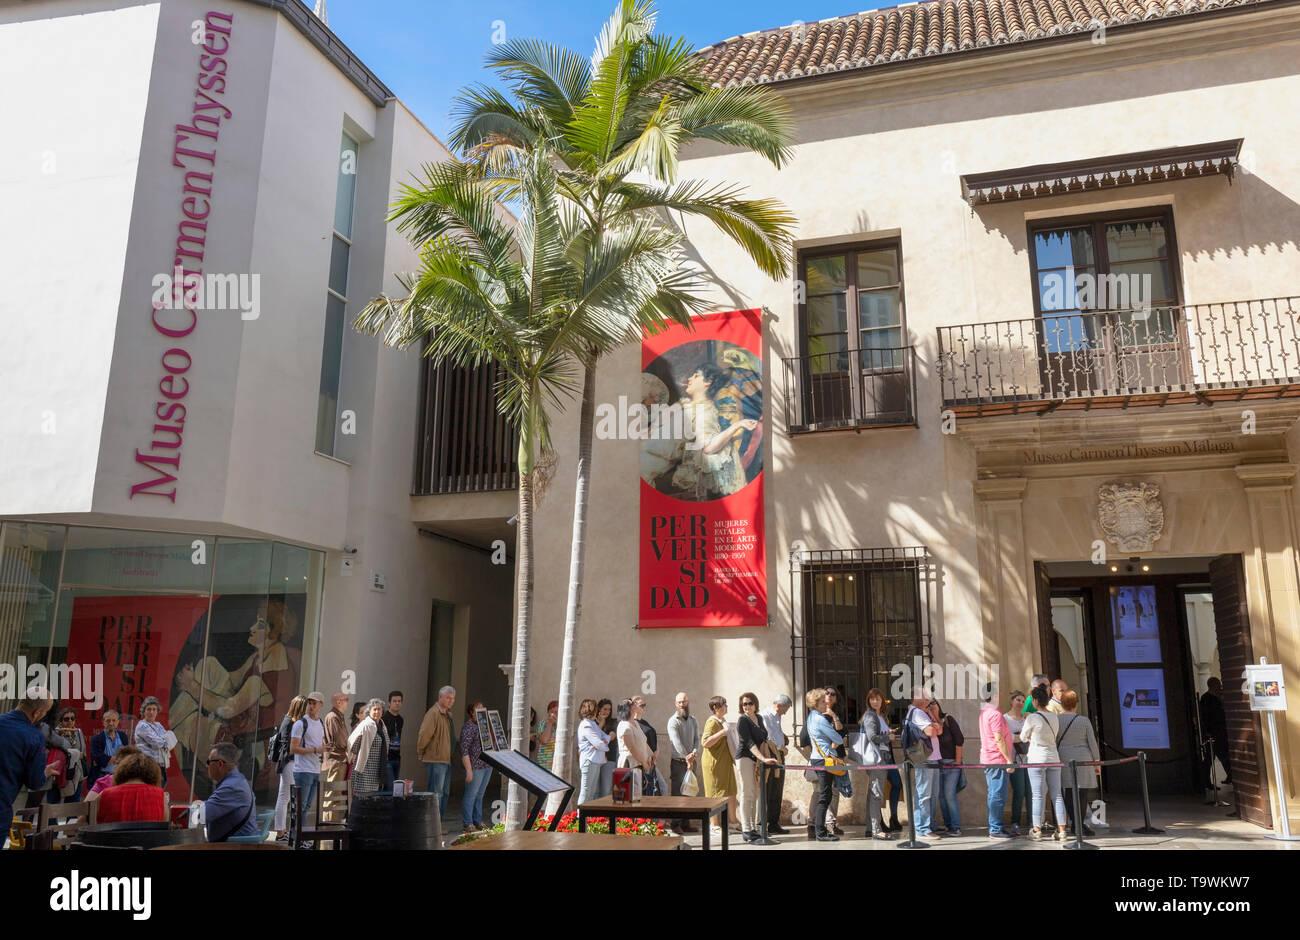 File d'attente hors du Musée Carmen Thyssen, Malaga, Costa del Sol, la province de Malaga, Andalousie, Espagne du sud. Photo Stock